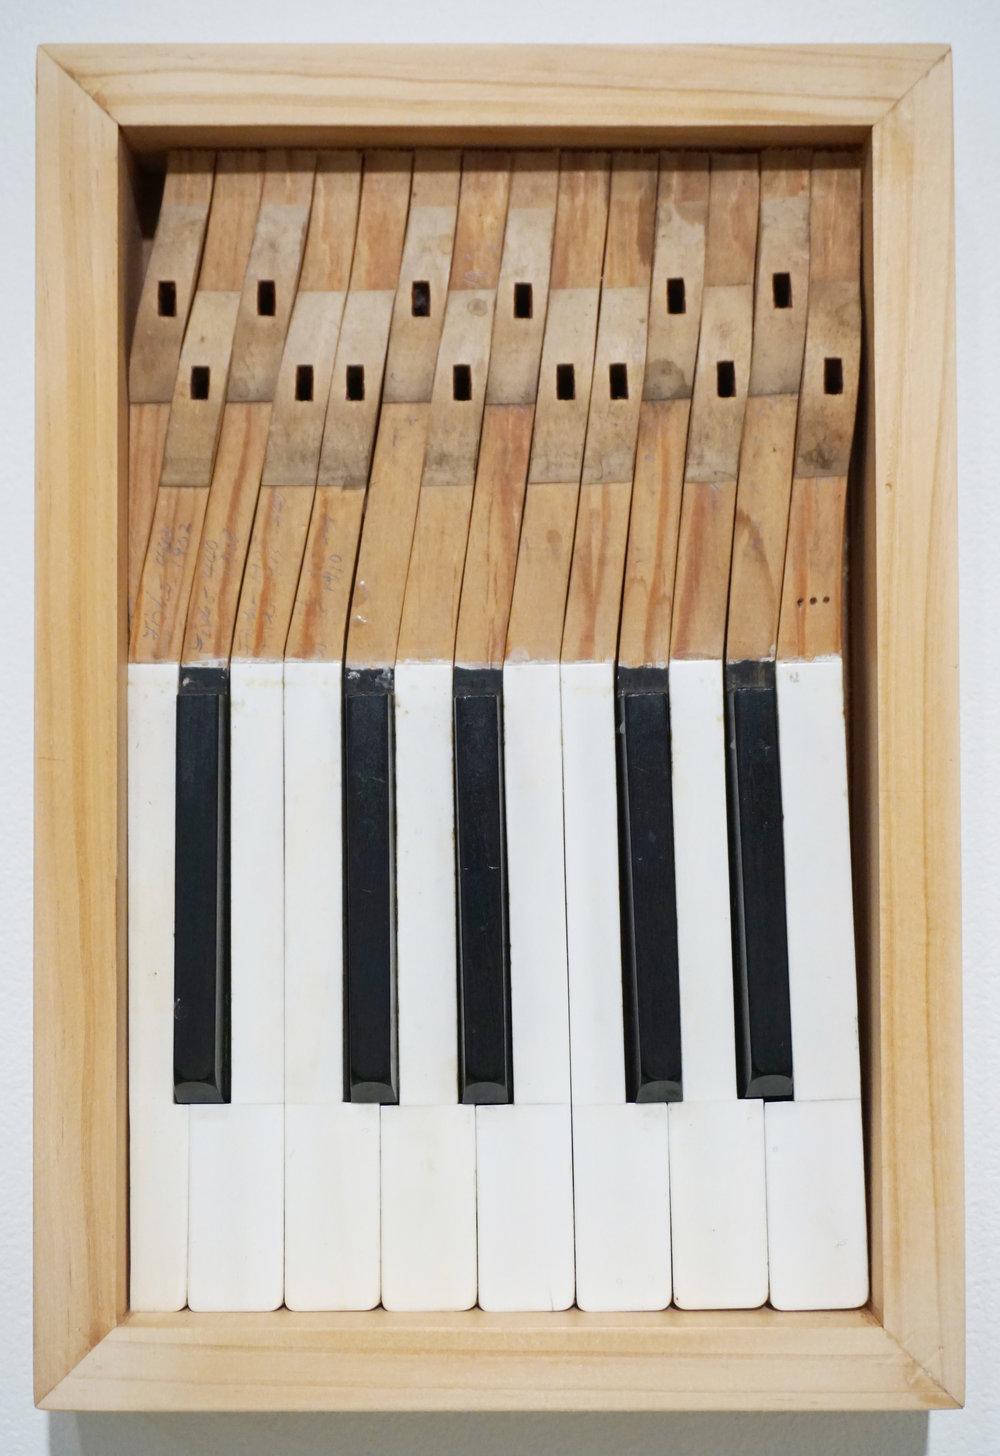 28. Marie Haass, Piano Tuner Diary 2, Assemblage, wood, ivory, ebony $250